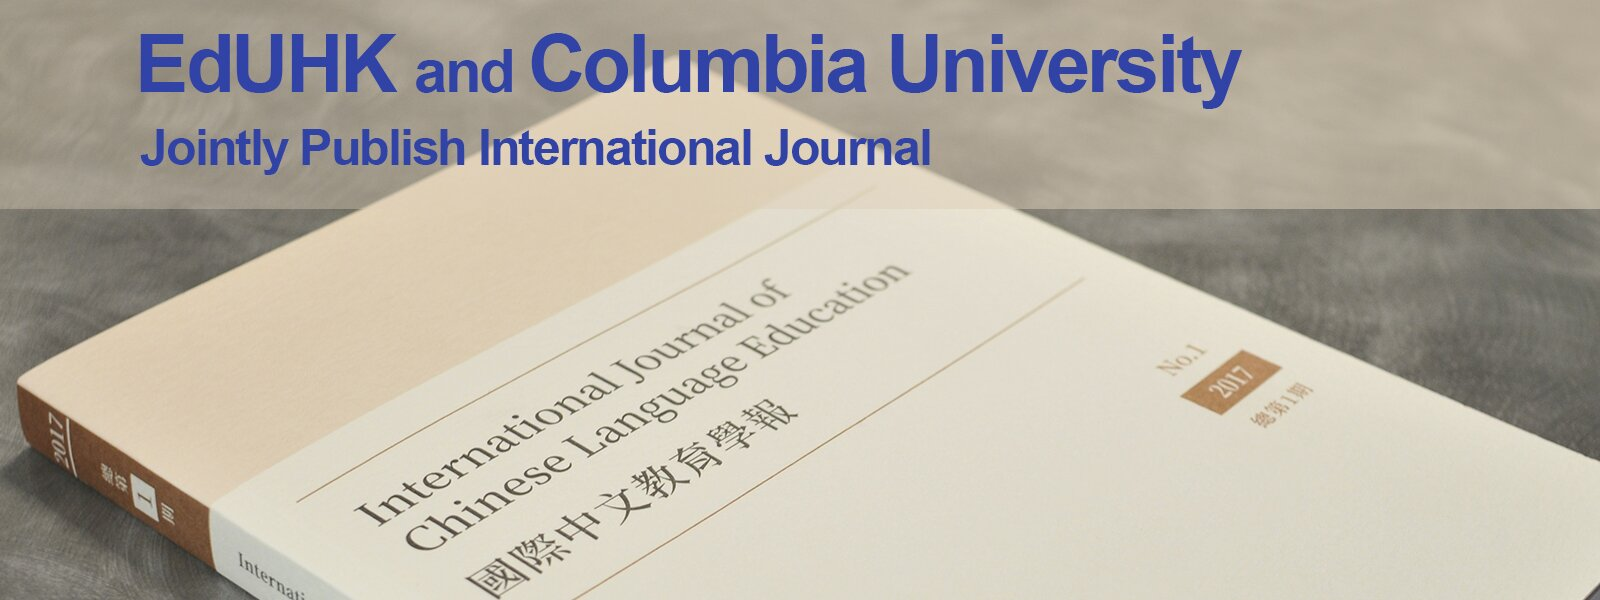 EdUHK and Columbia University Jointly Publish International Journal